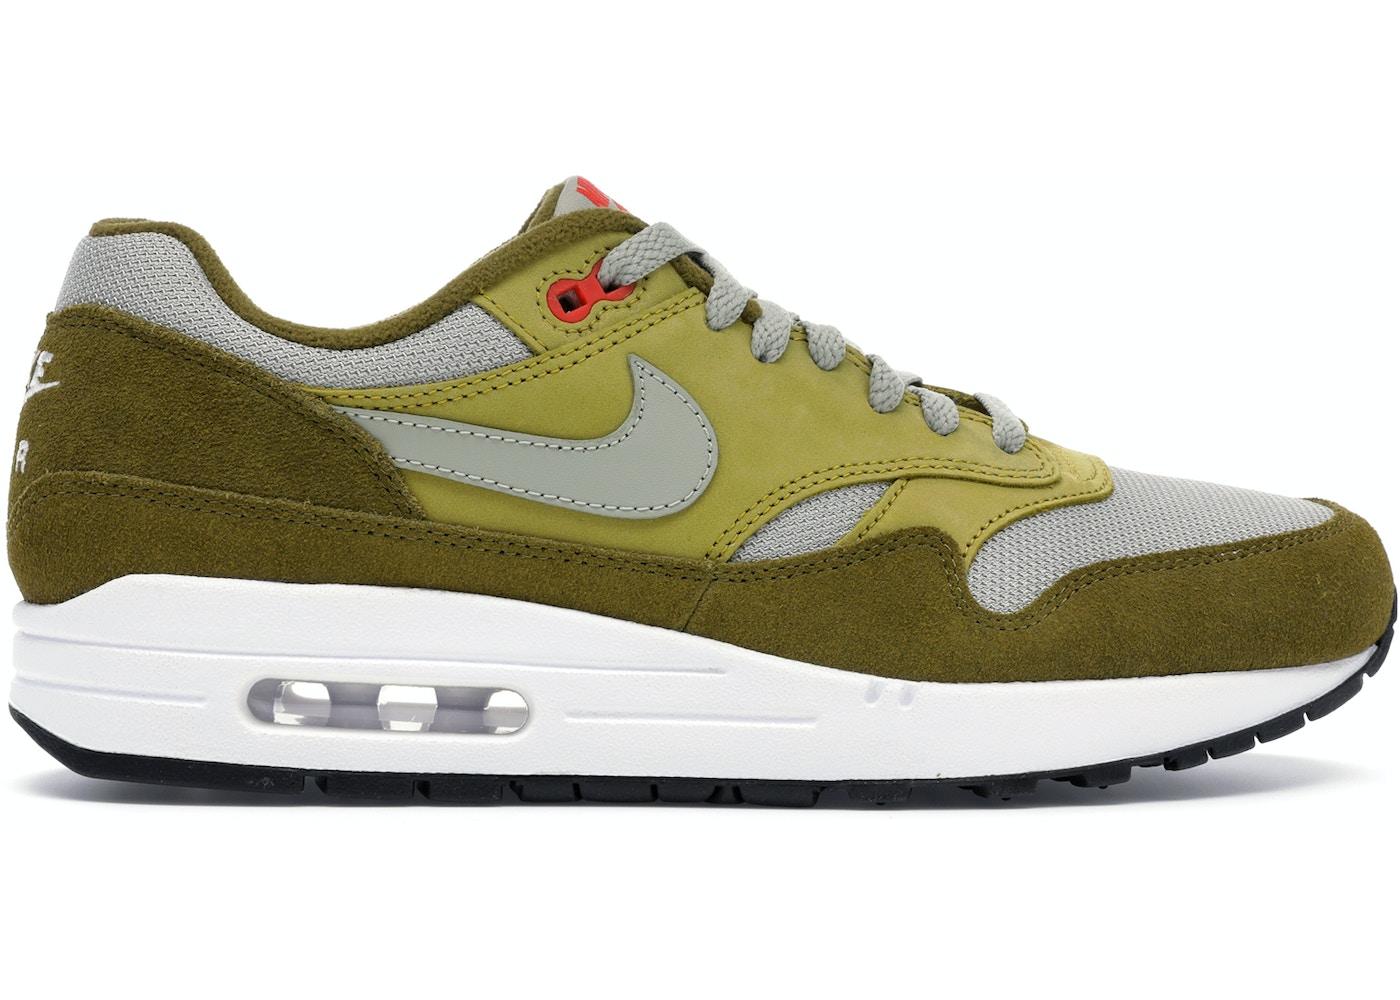 6009d77d84 Buy Nike Air Max 1 Shoes & Deadstock Sneakers